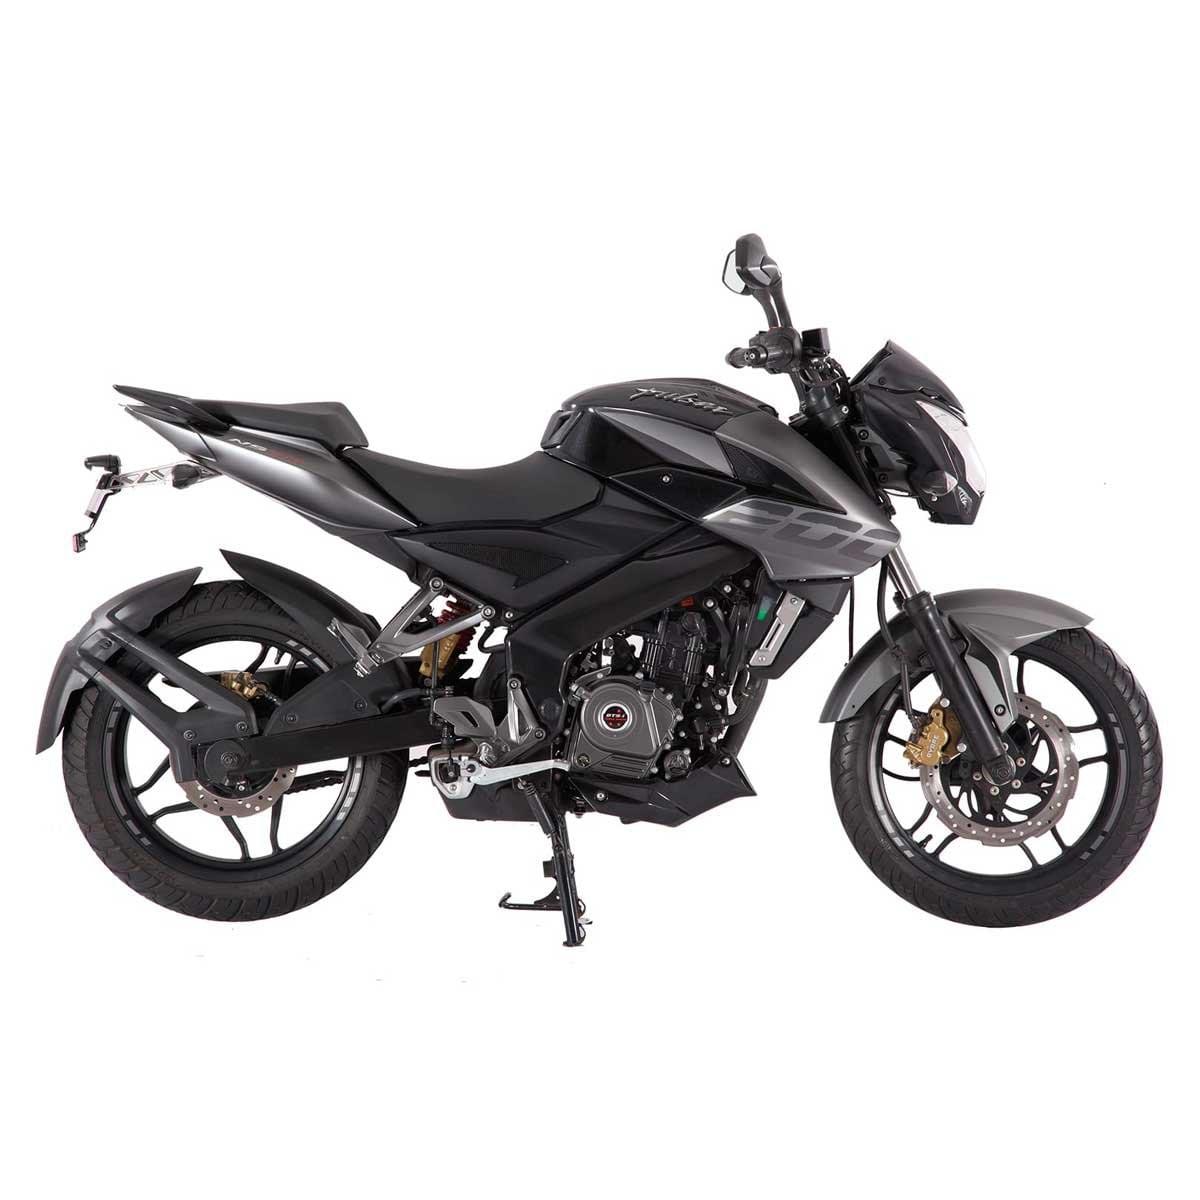 Motocicleta Pulsar Ns 200 Cc Negra Bajaj